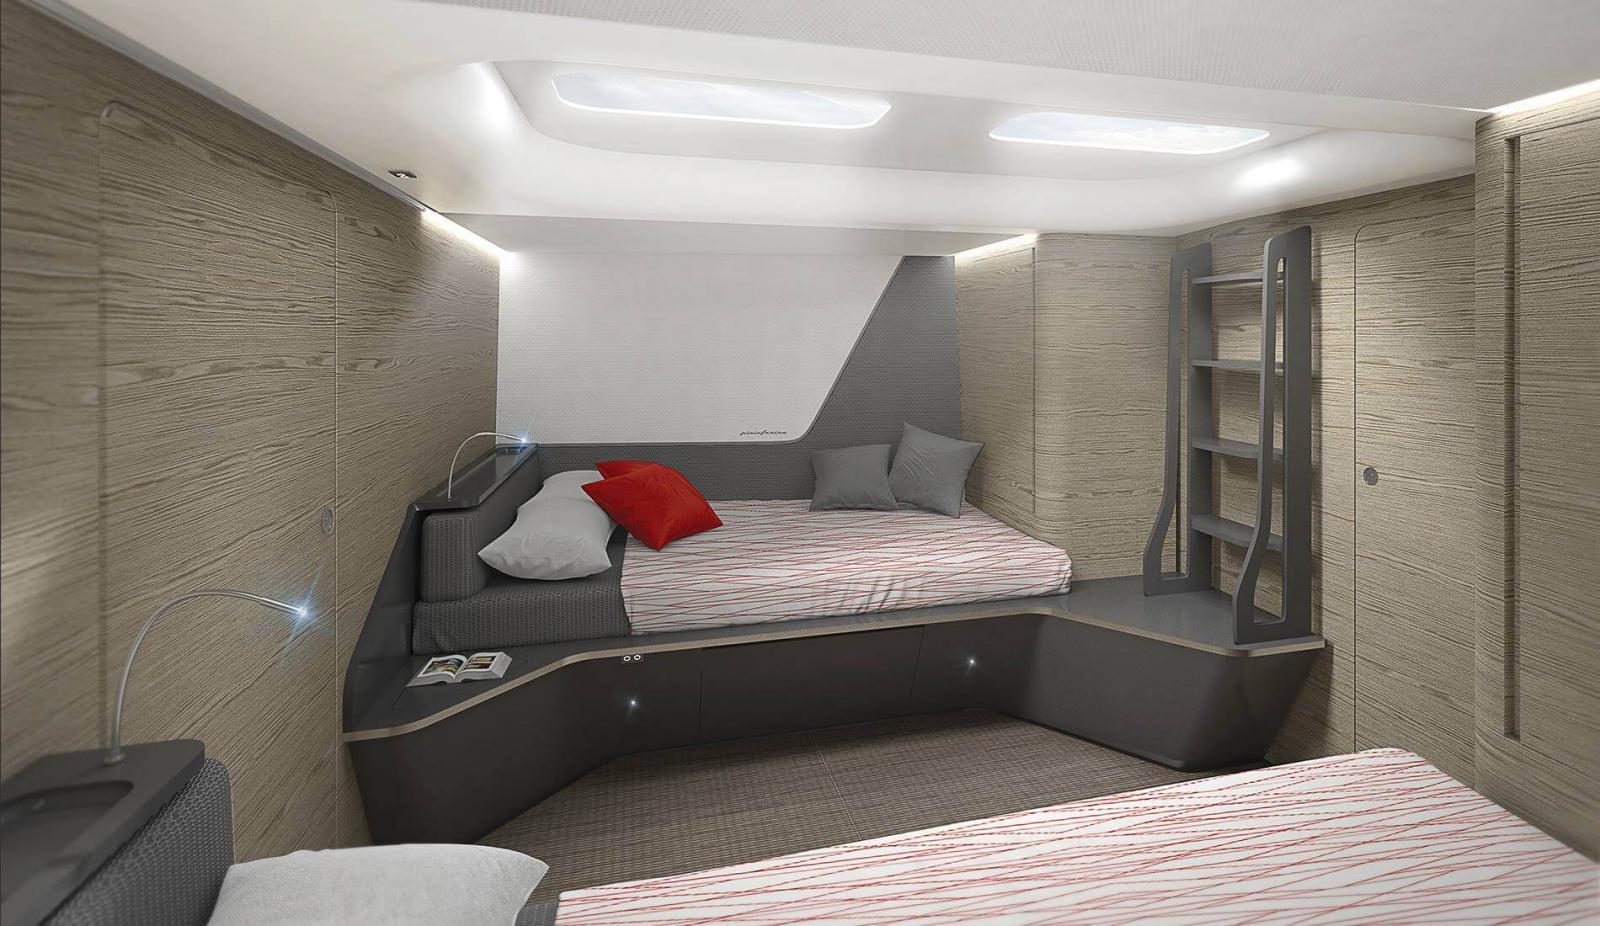 Wallycento Hull 4 Tango - Sailing Yacht - Guest Room